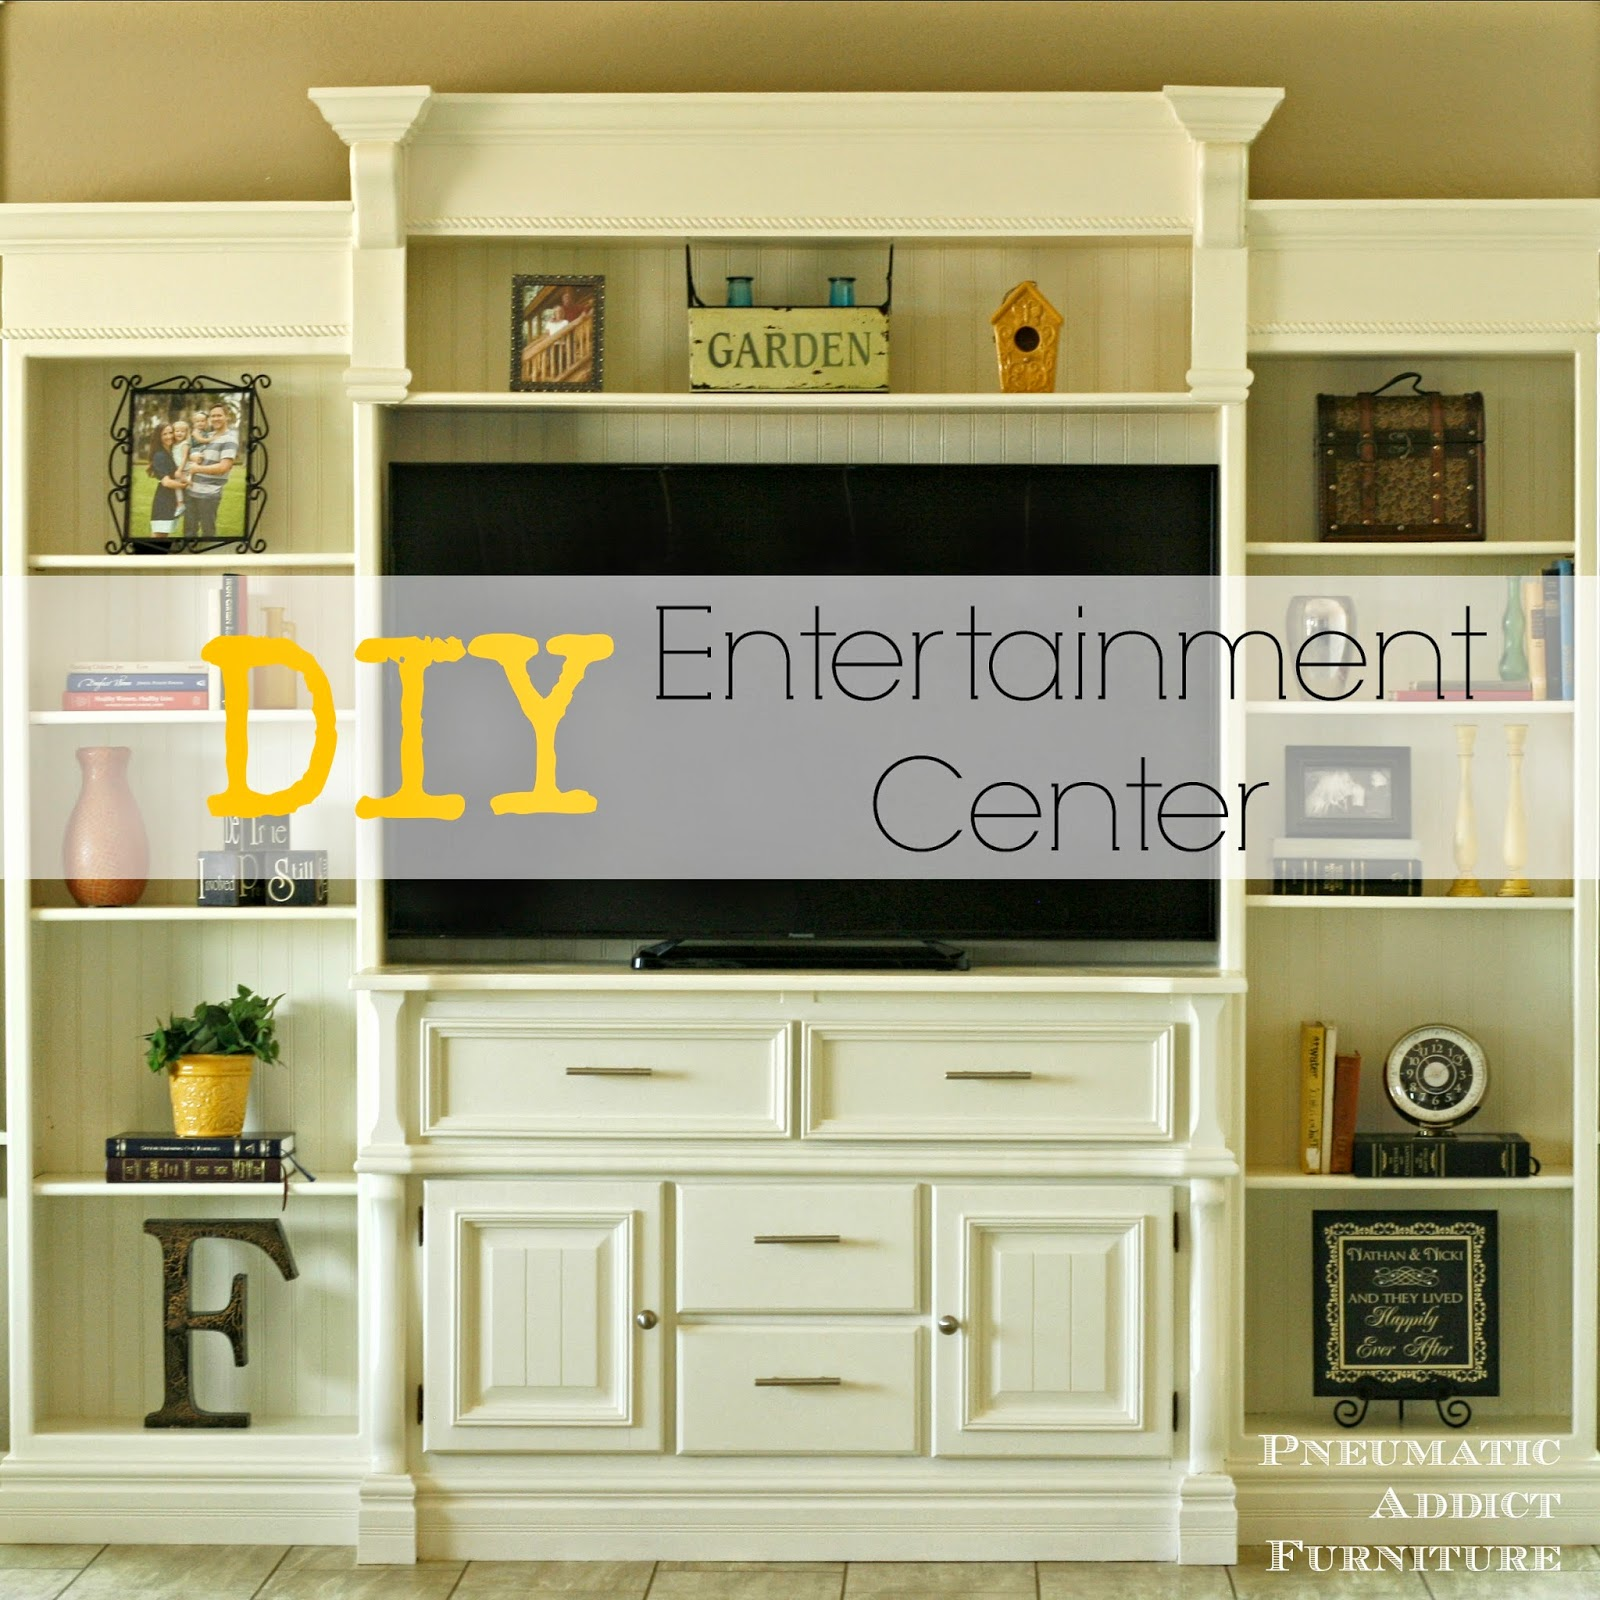 DIY Entertainment Center Square